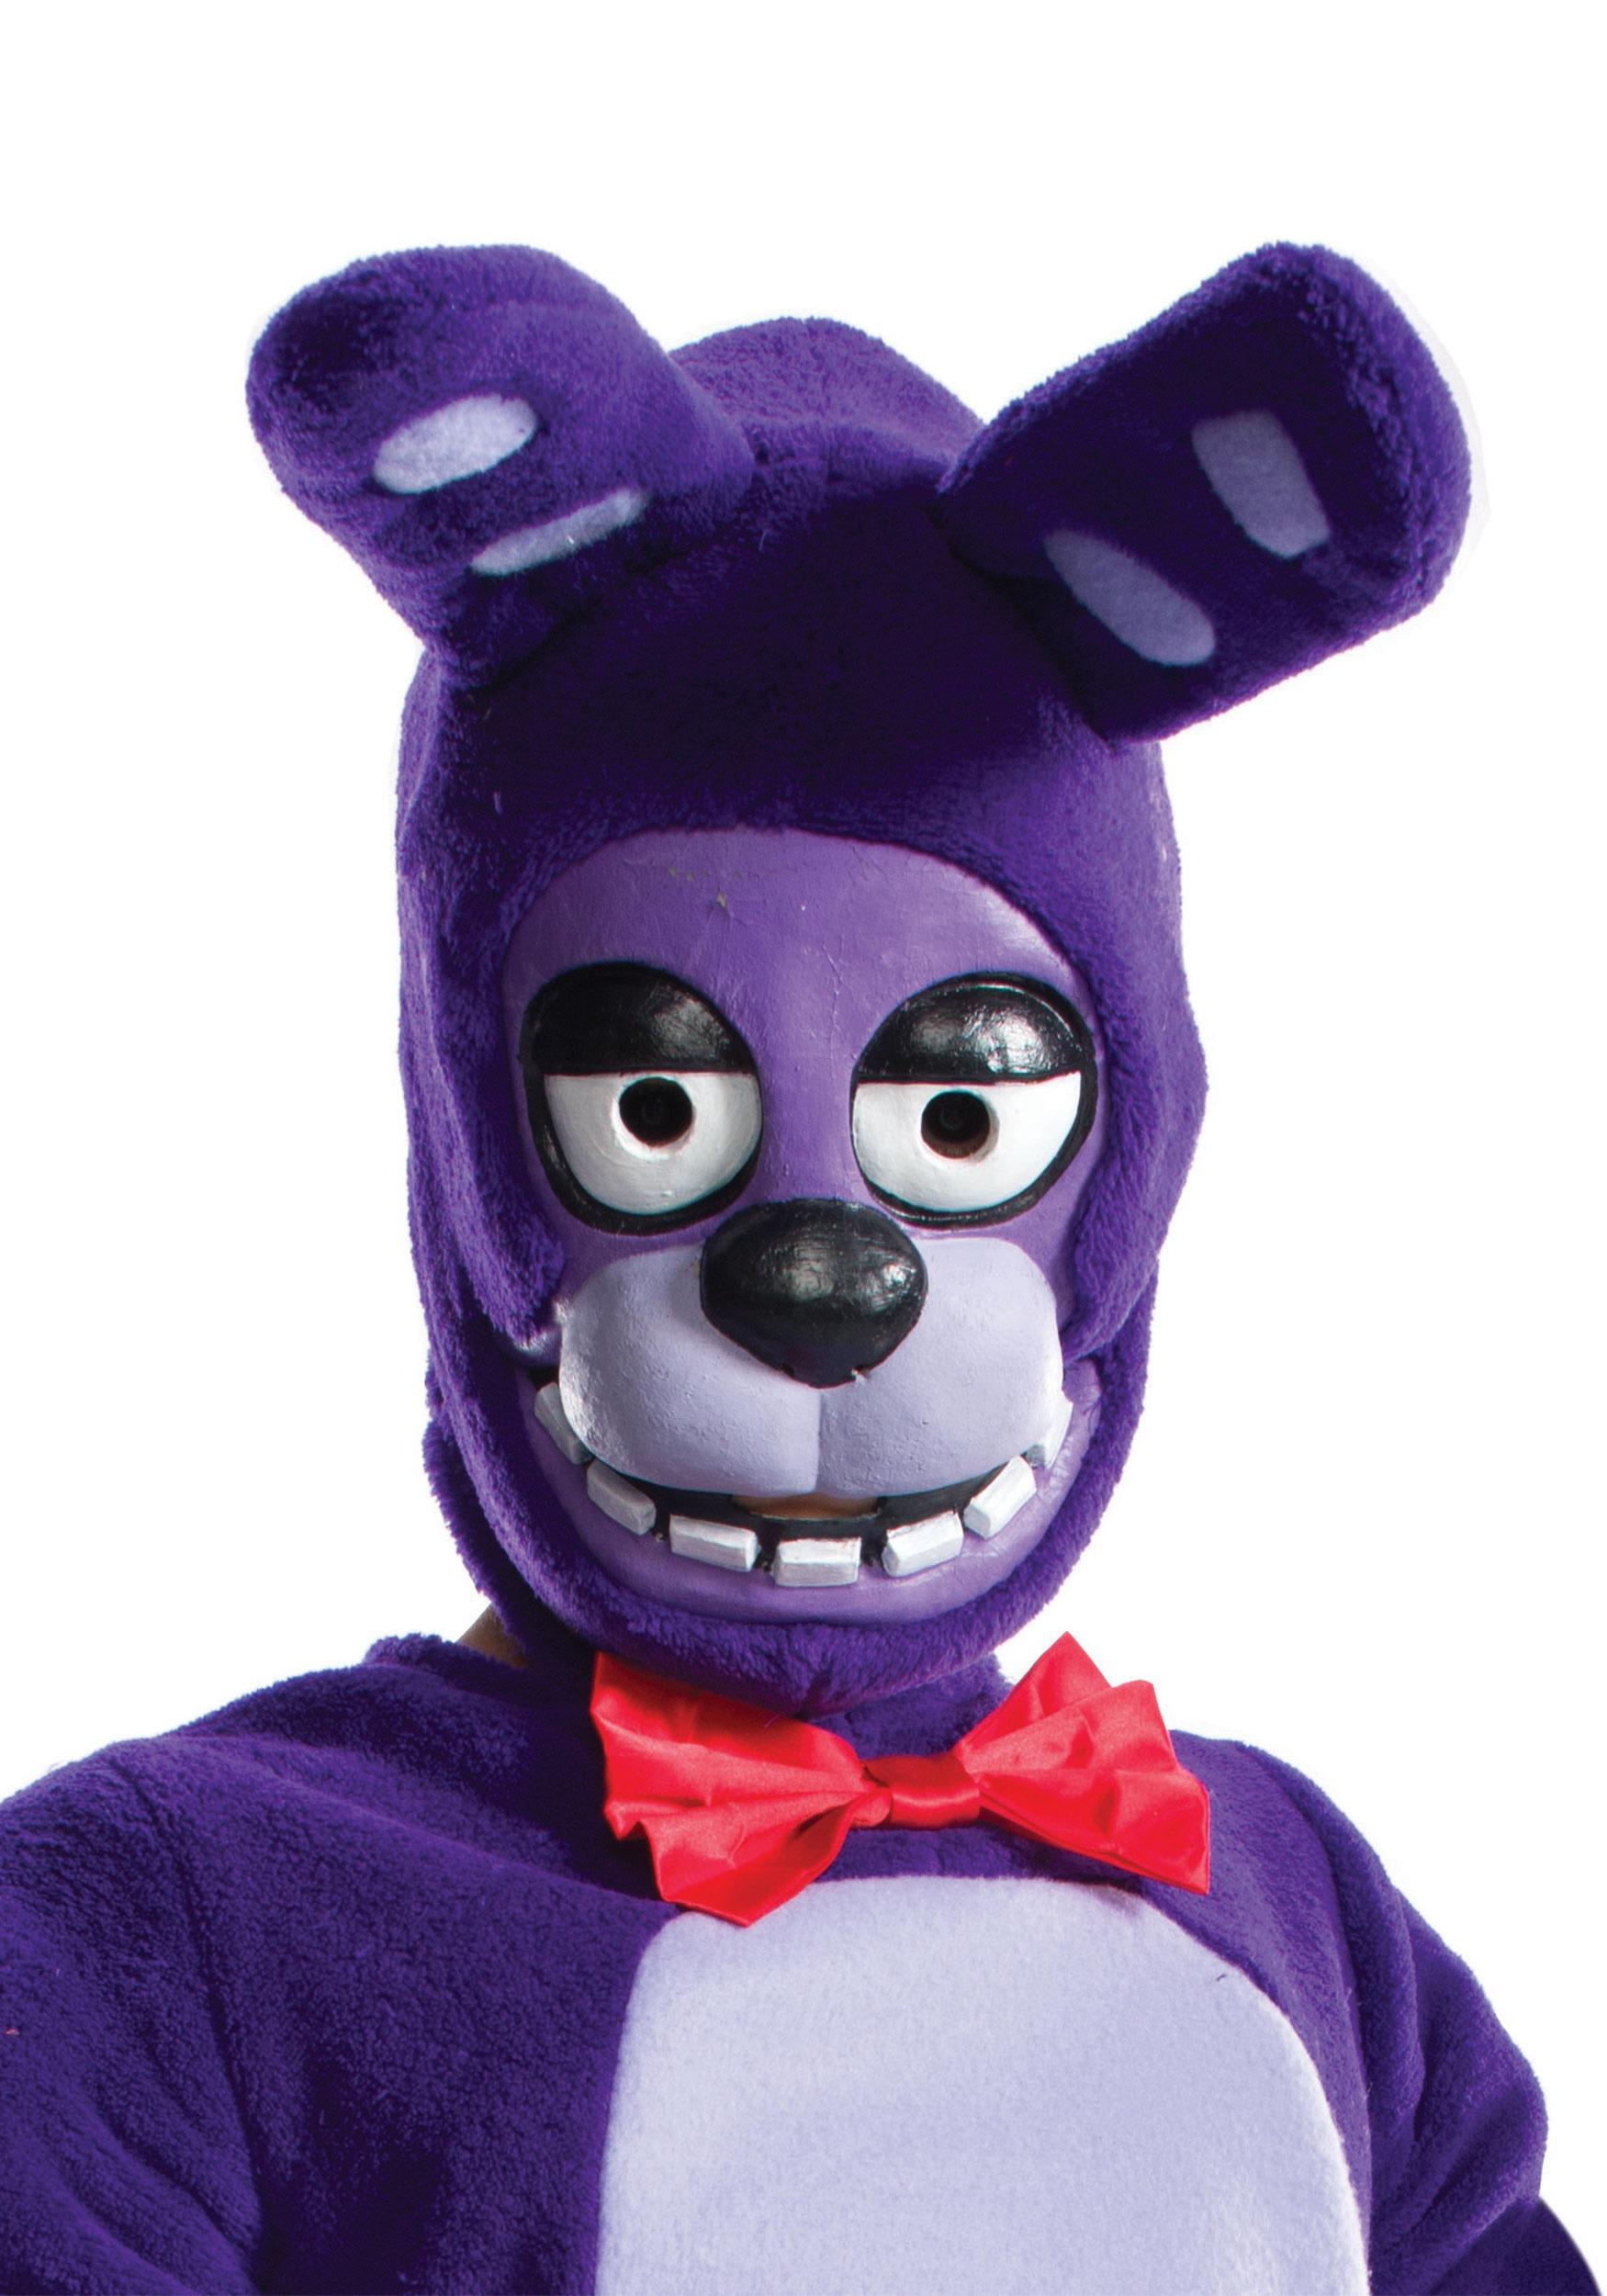 Fnaf bonnie costume for sale - Five Nights At Freddy S Kids Bonnie Mask